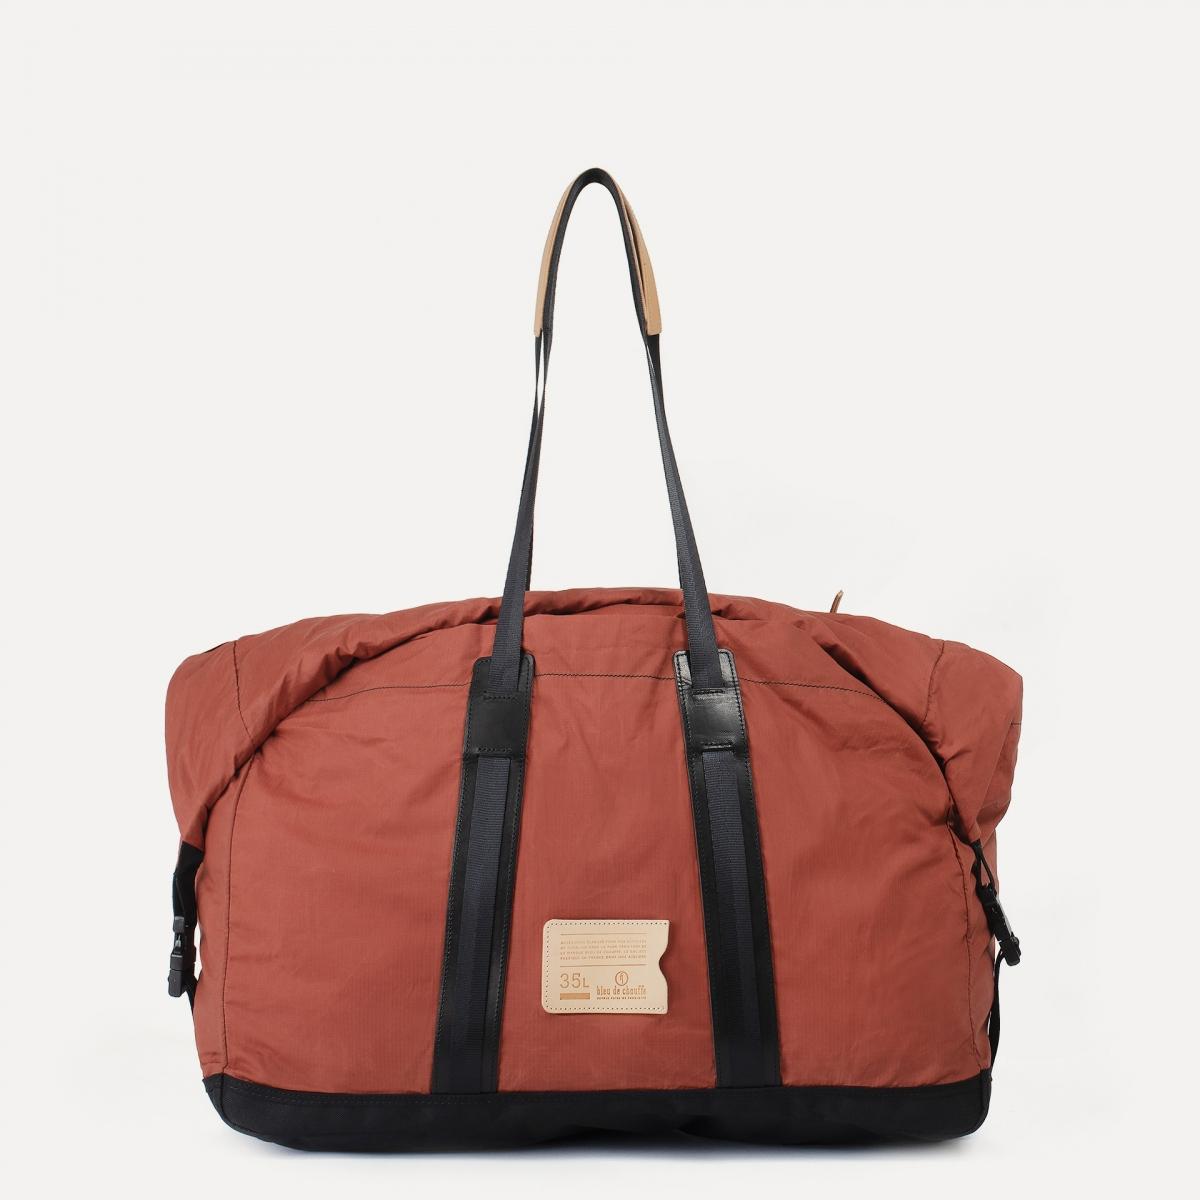 35L Baroud Travel bag - Burgundy (image n°1)